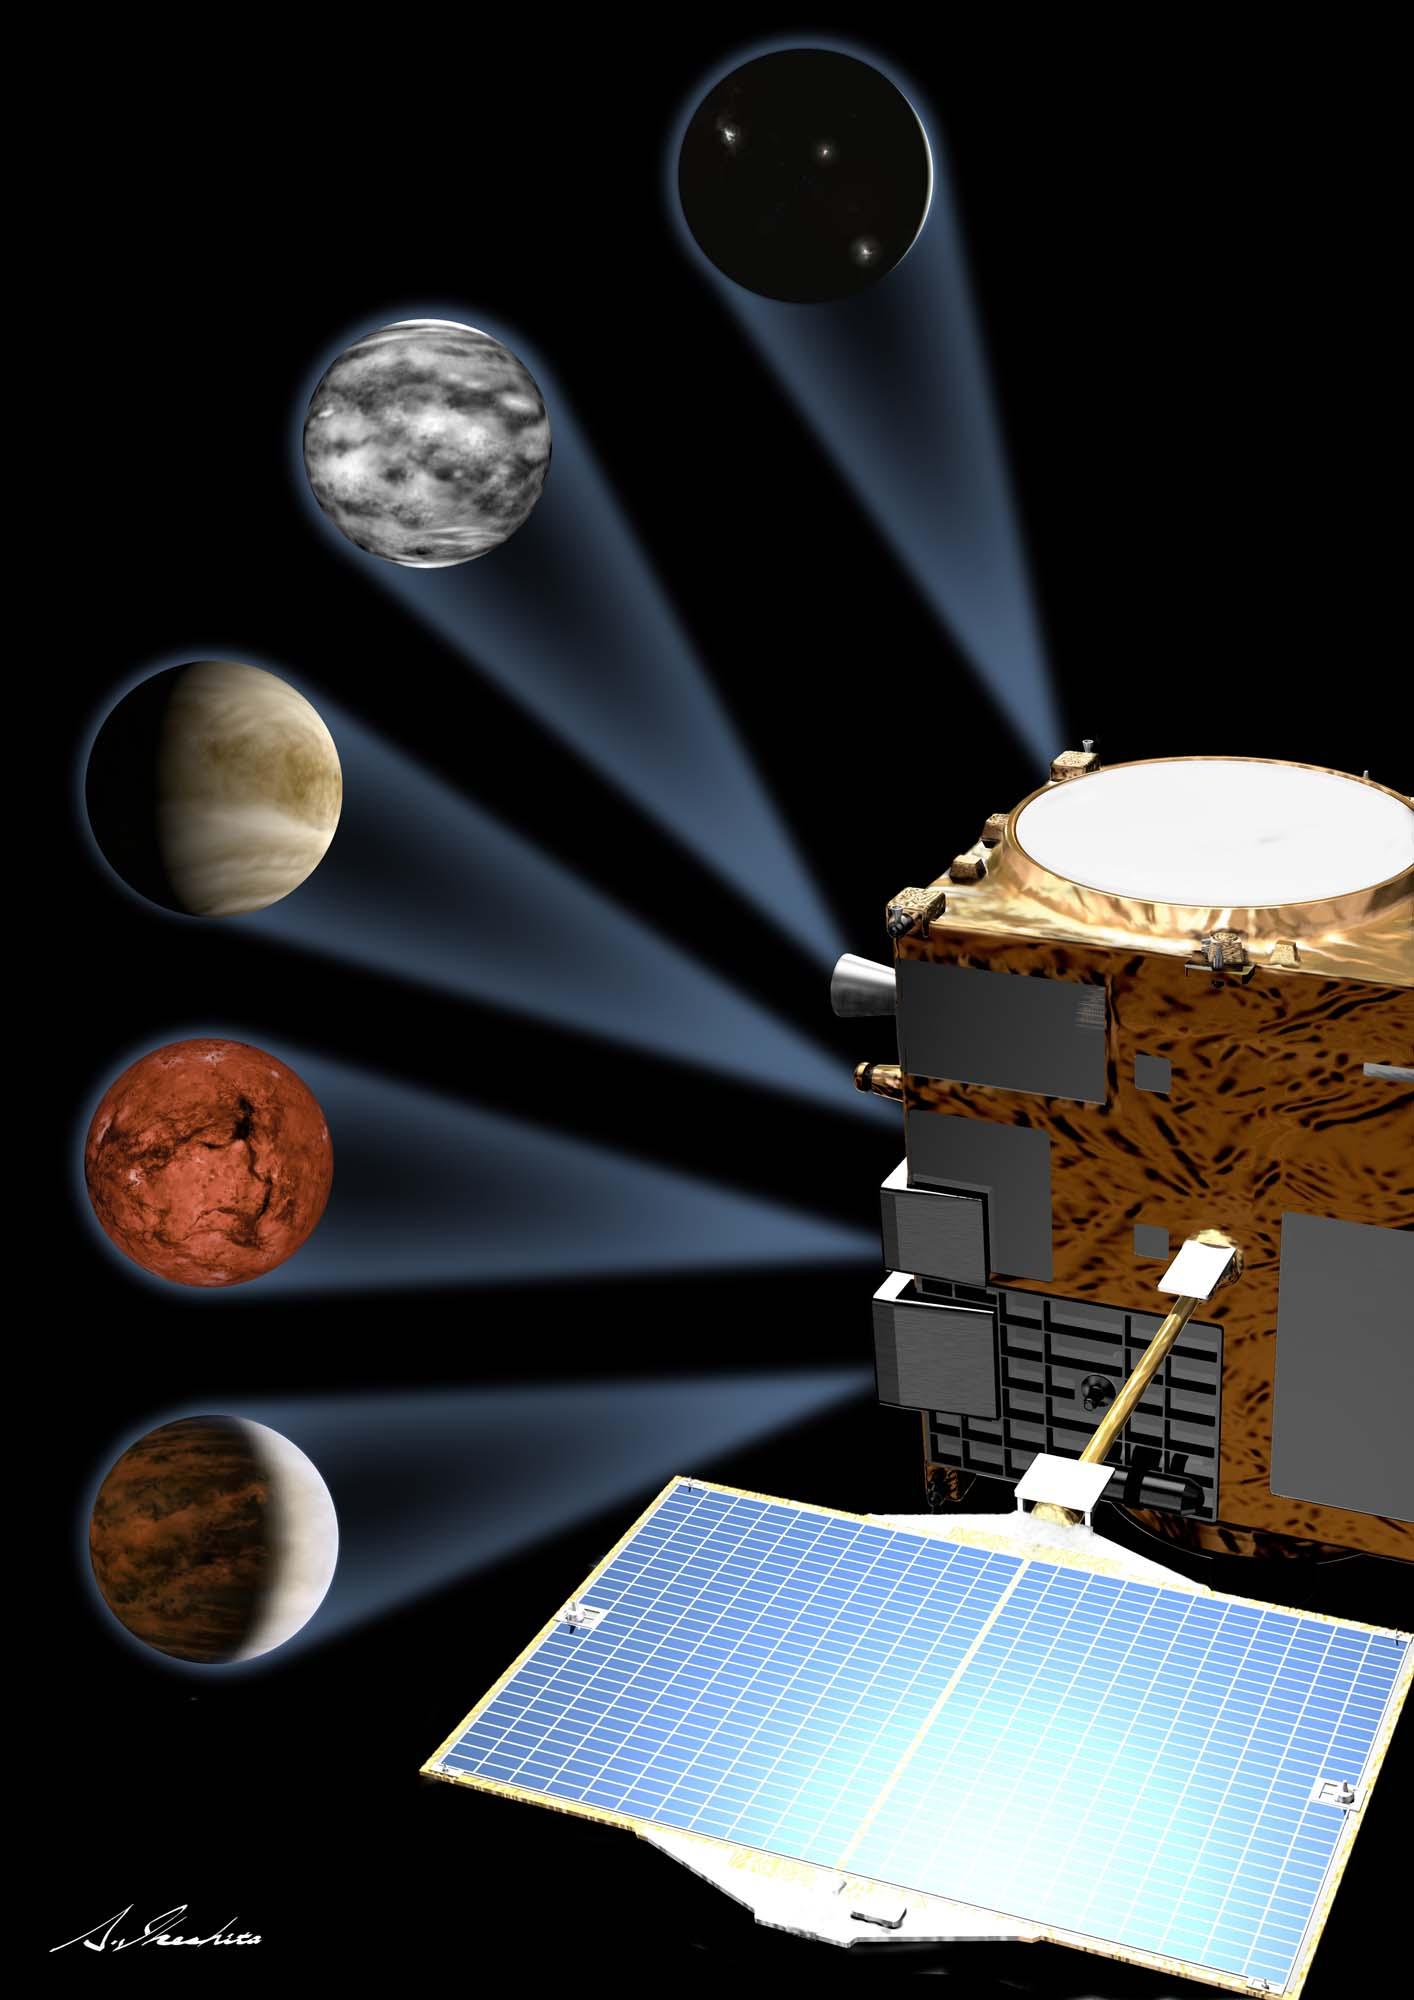 Akatsuki's five cameras will study the atmosphere of Venus. Credit: JAXA